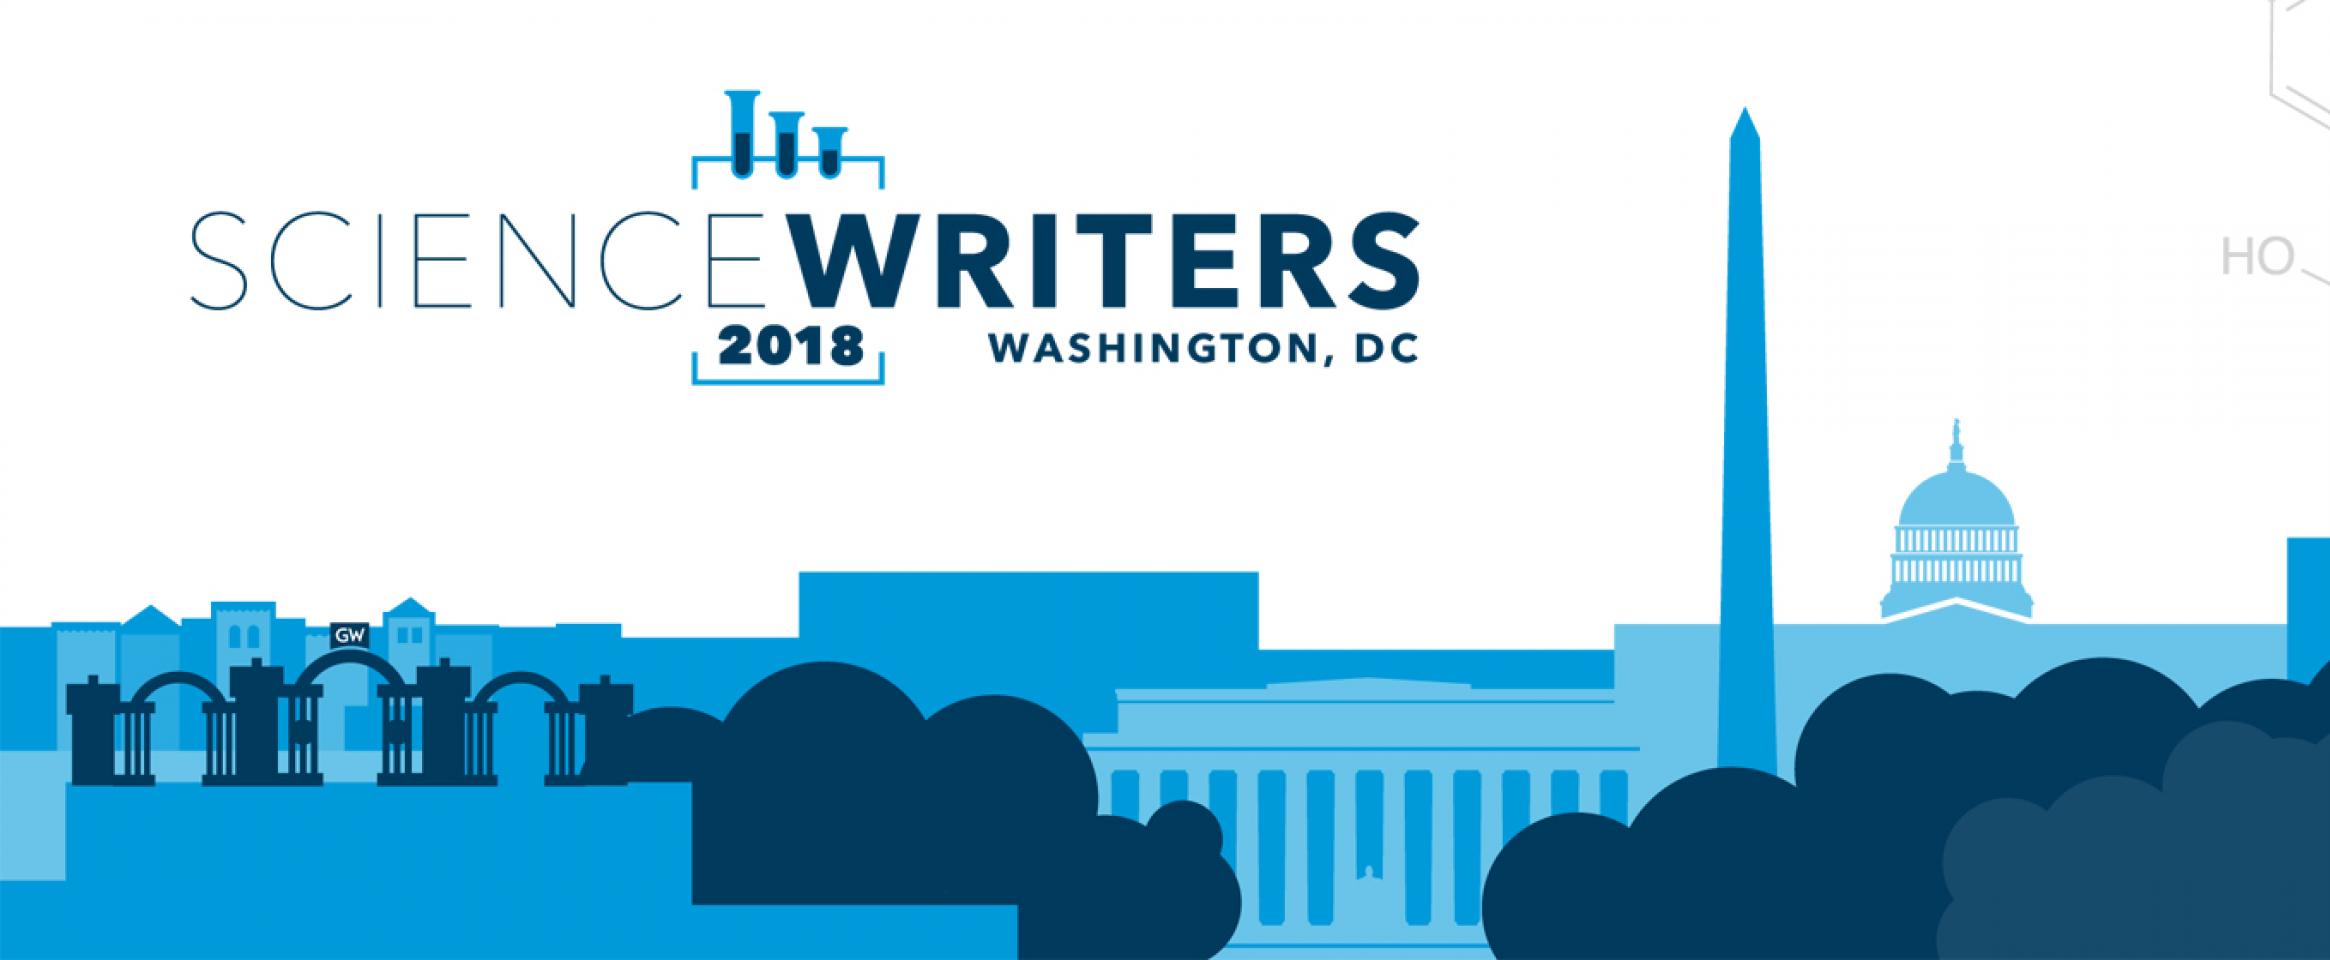 ScienceWriters 2018 logo